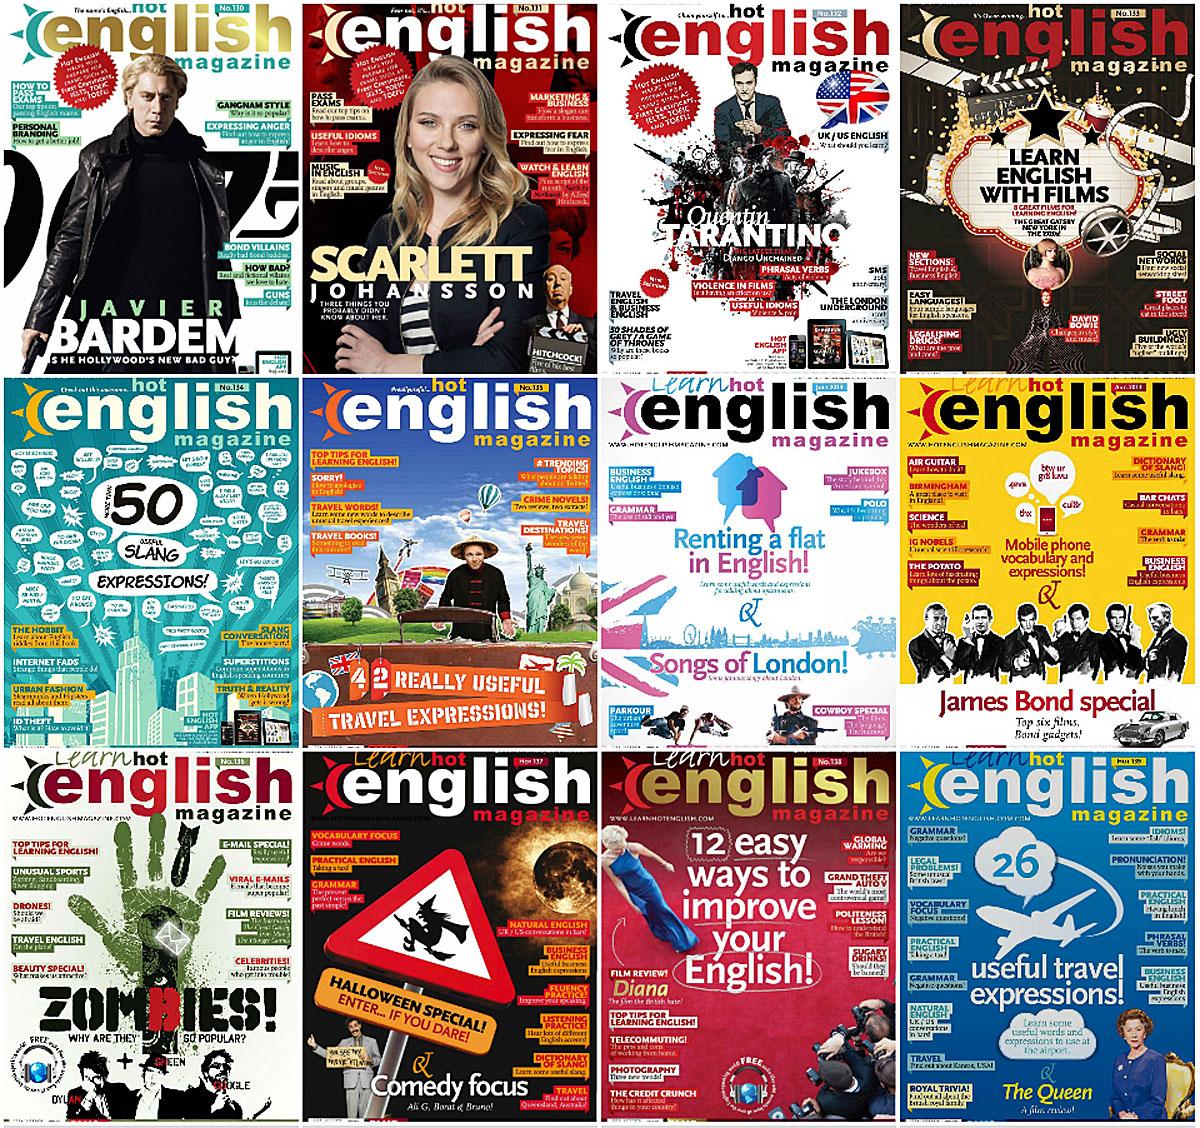 LEARN HOT ENGLISH MAGAZINE PDF DOWNLOAD